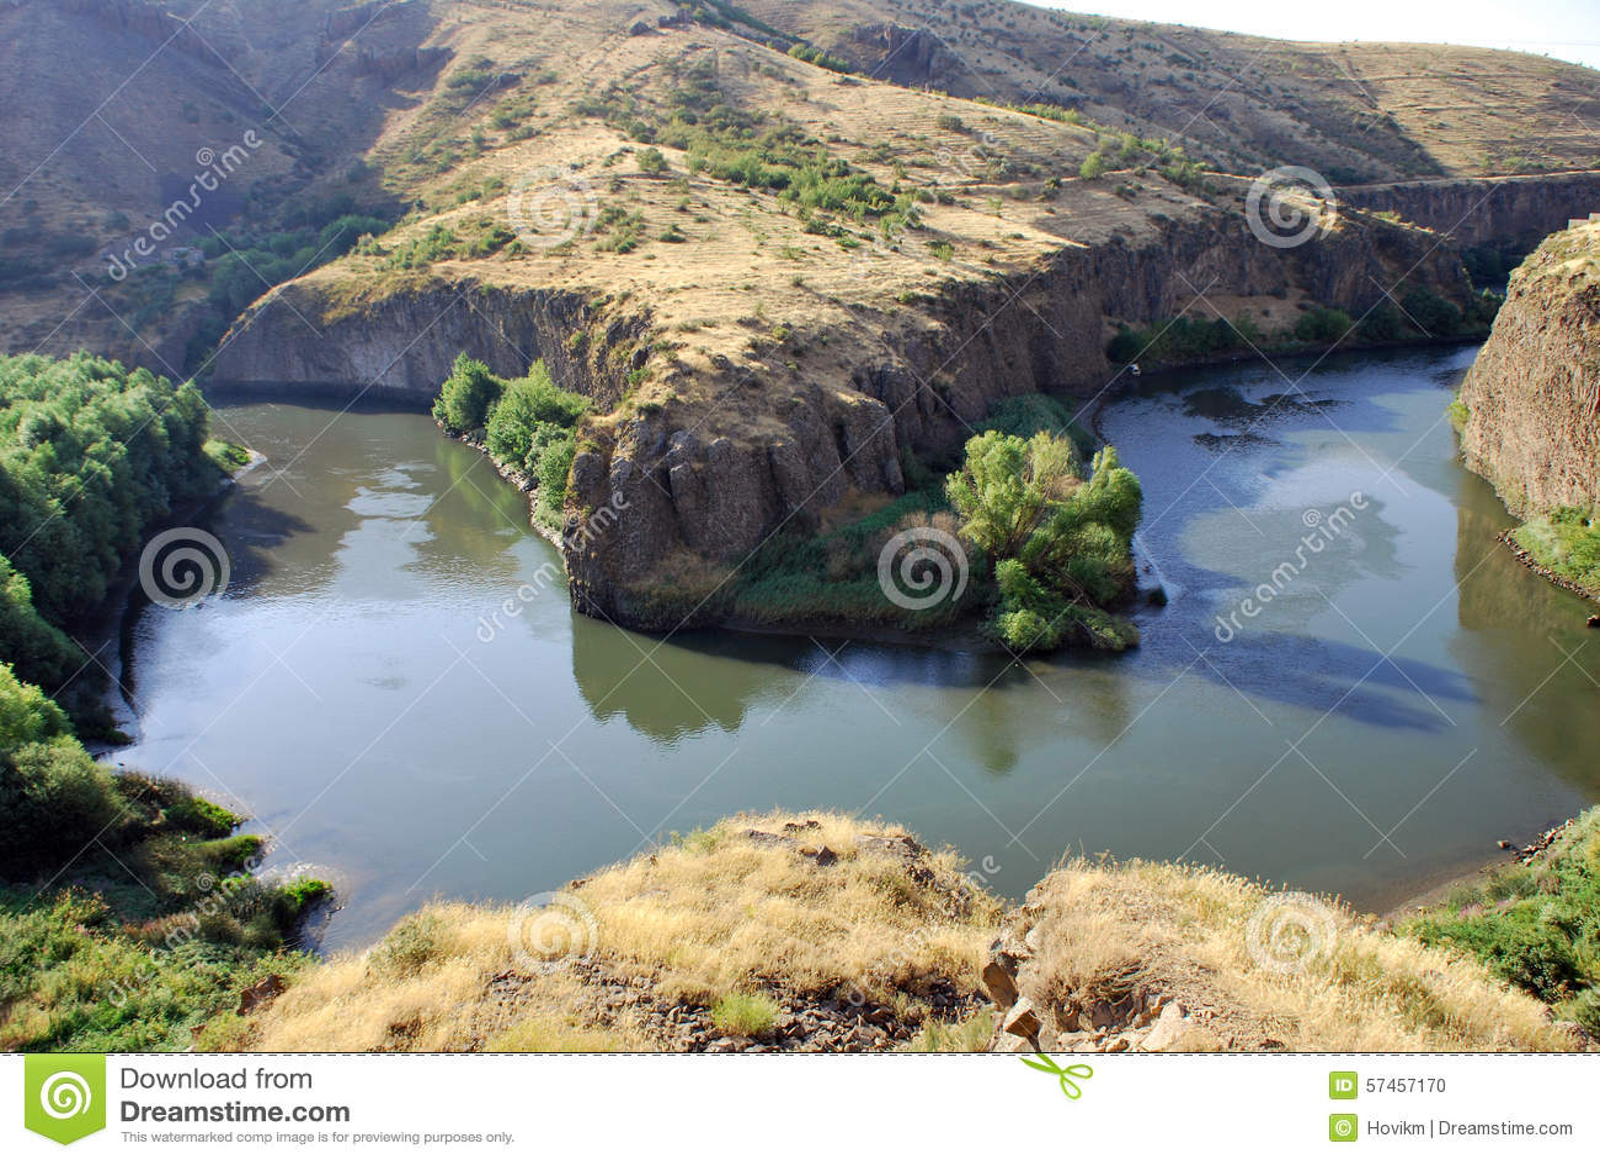 Fluss In Armenien 4 Buchst